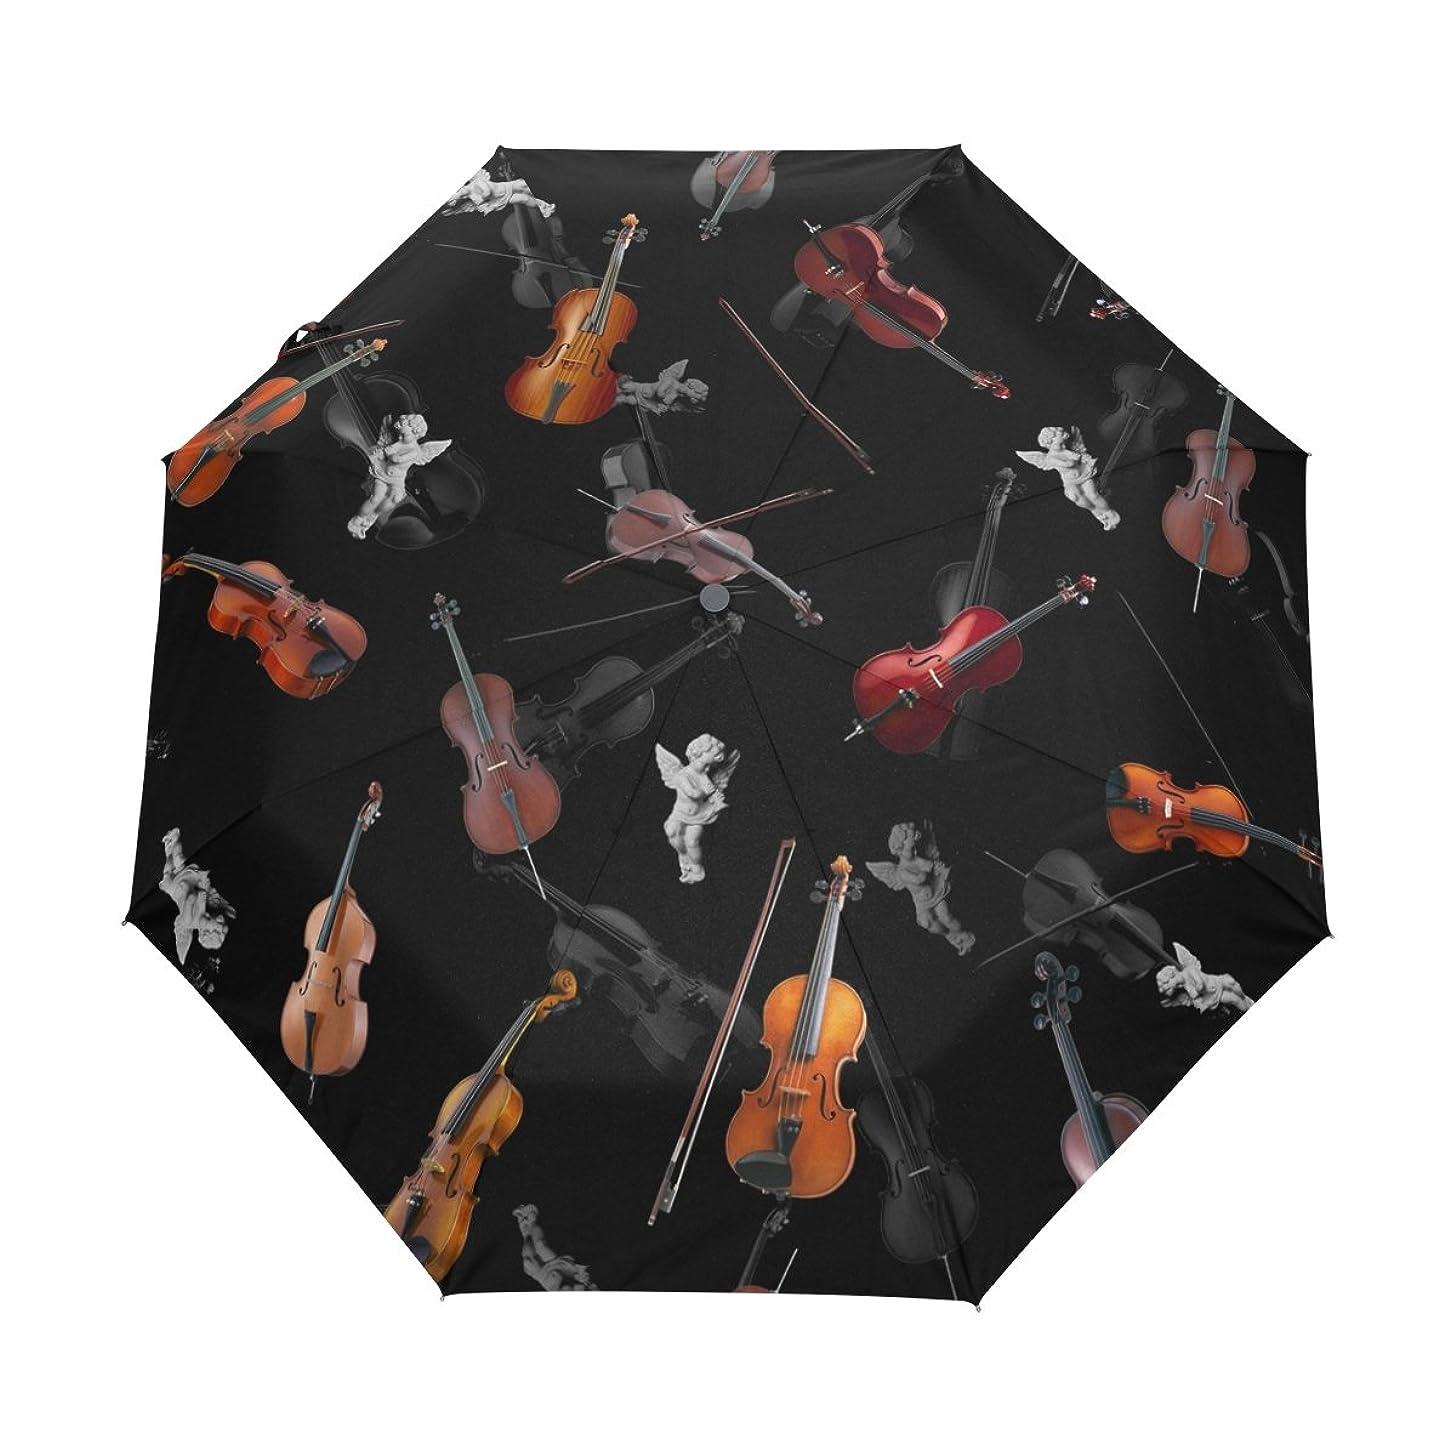 Ethel Ernest Creative Violins Folding Windproof Umbrella Waterproof Auto Foldable Umbrella